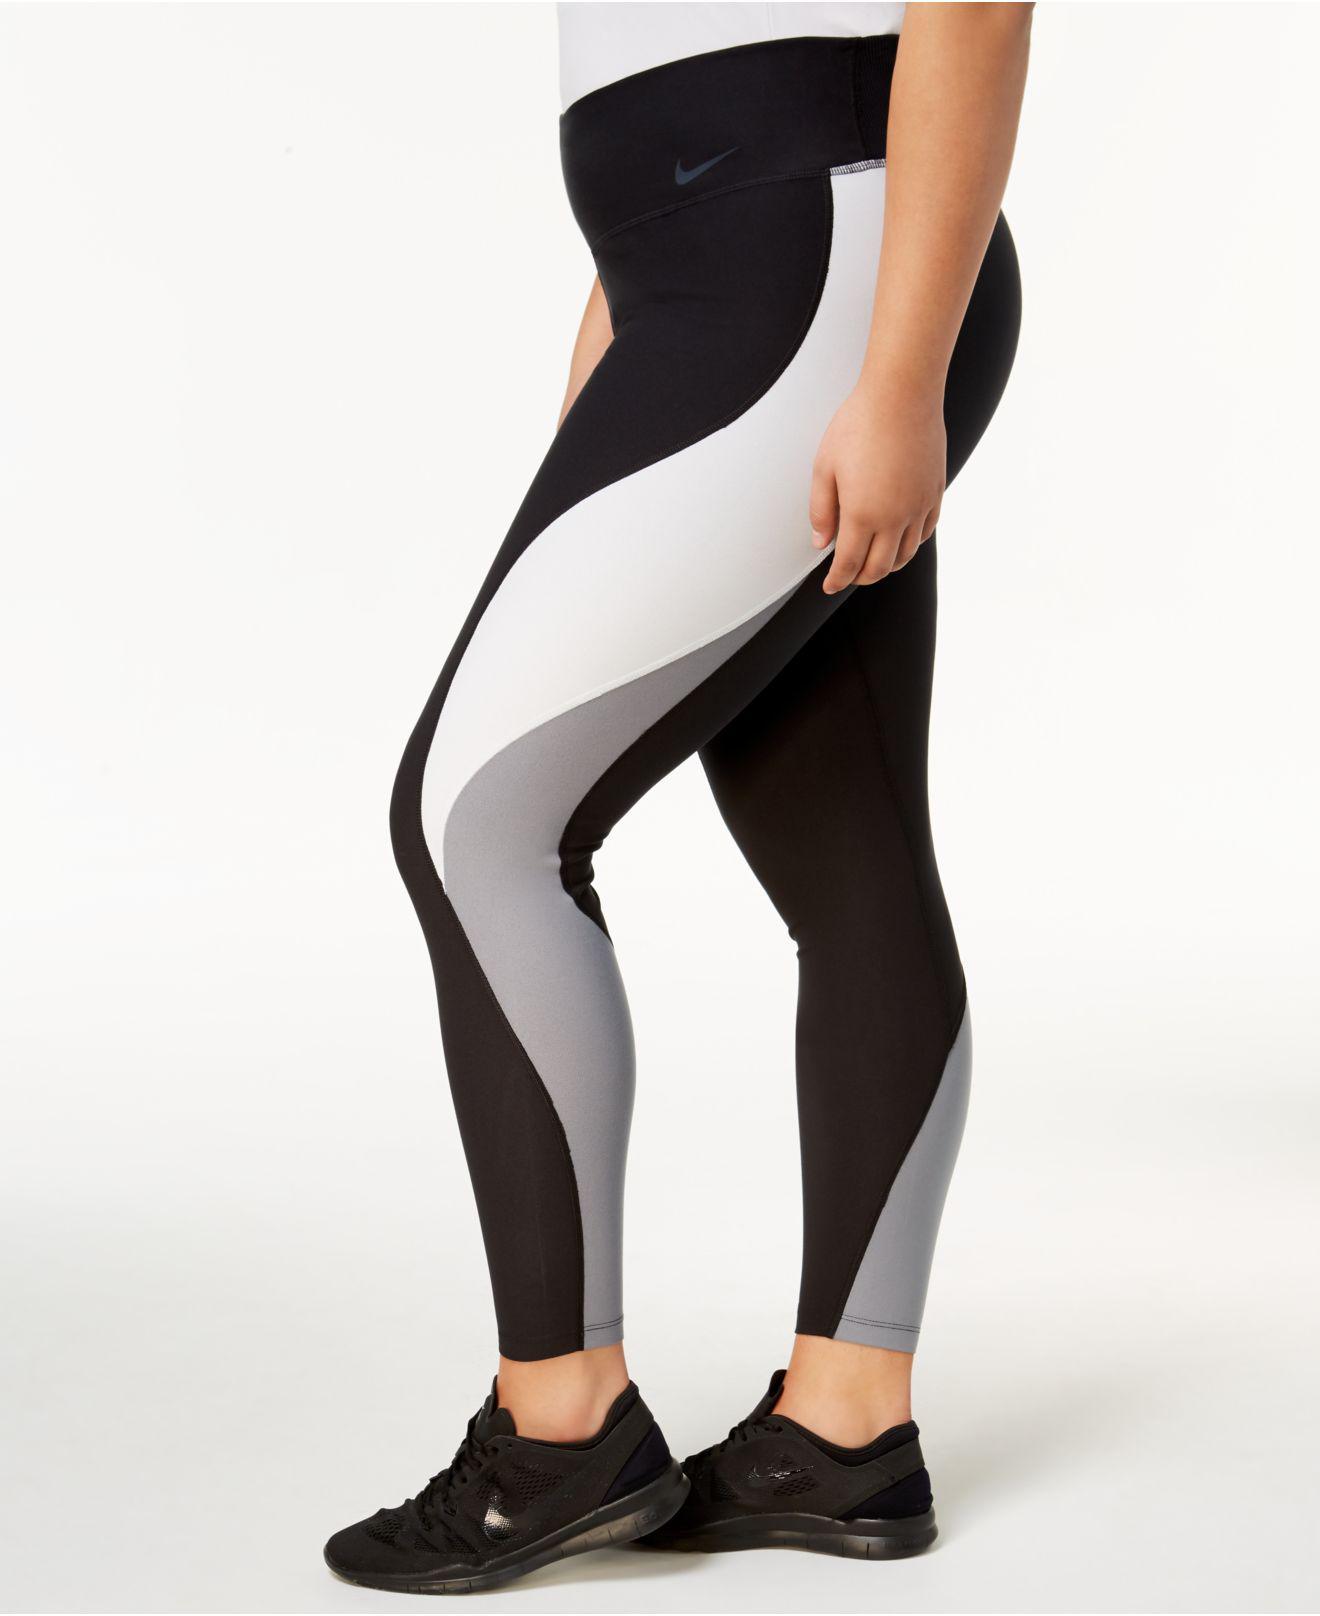 5b06af33a7 Lyst - Nike Plus Size Power Legend Colorblocked Leggings in Black